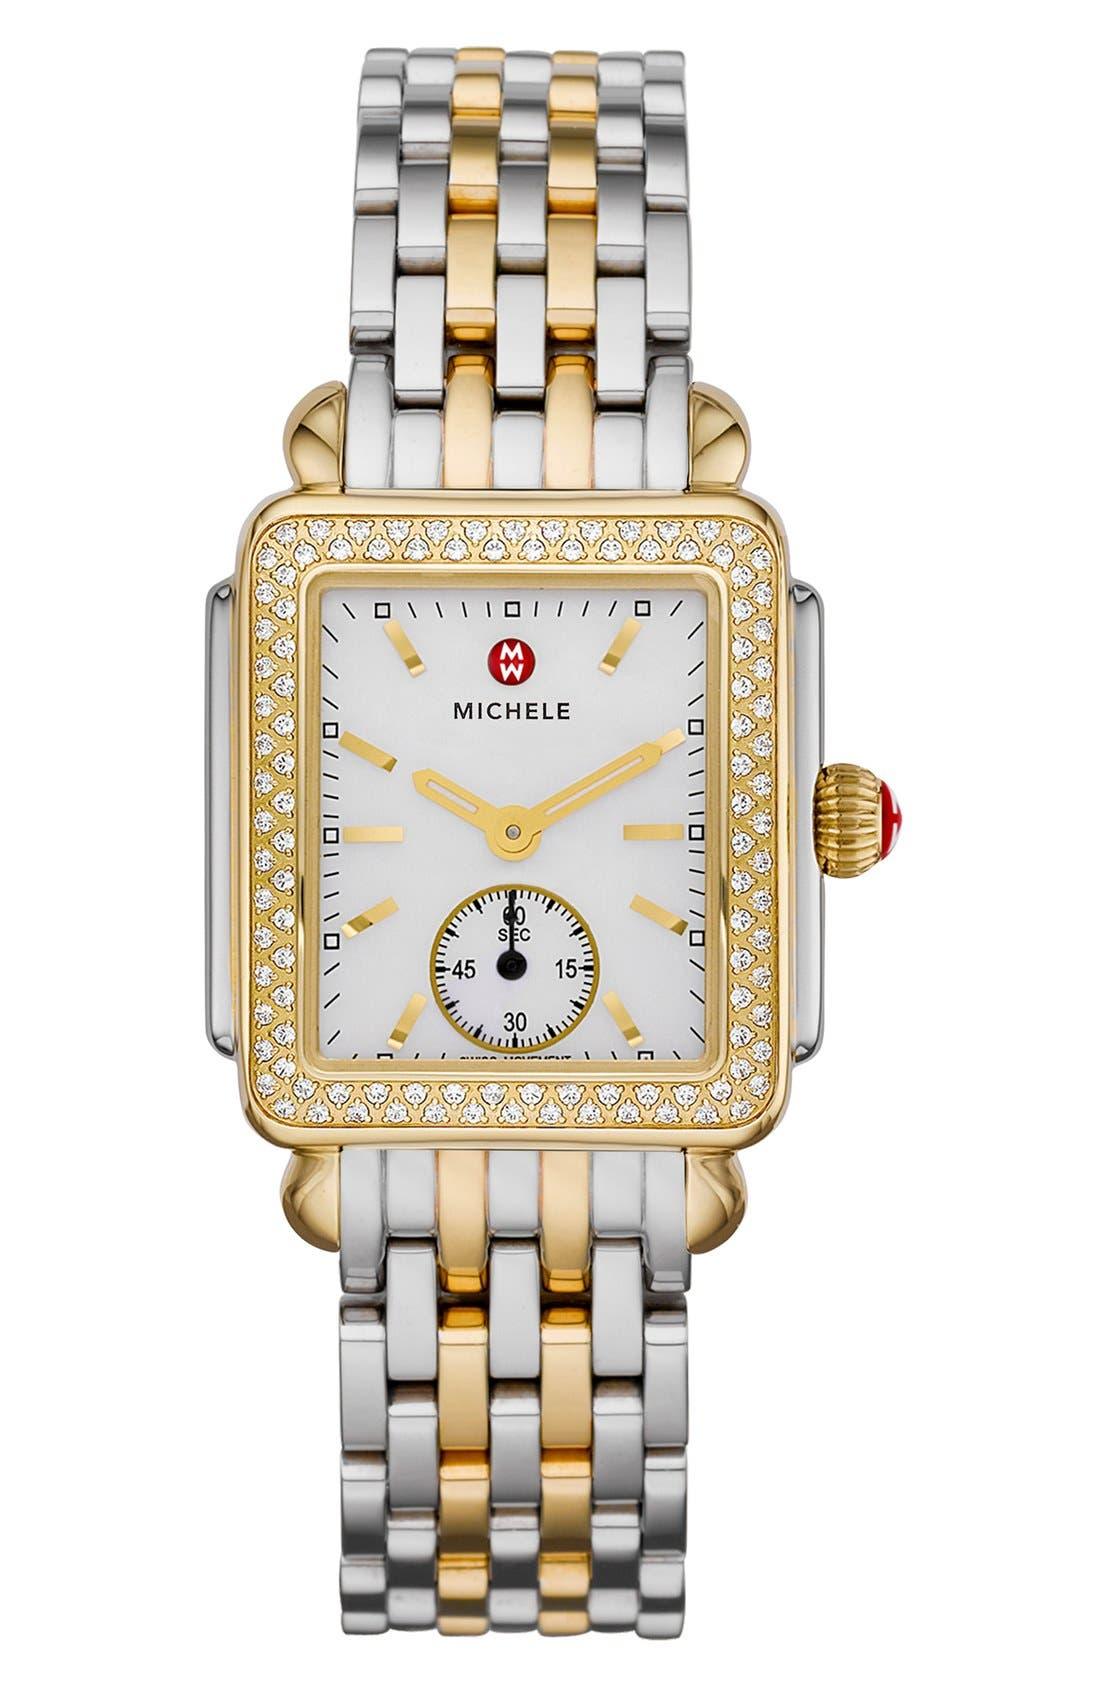 Deco 16 16mm Two-Tone Bracelet Watchband,                             Alternate thumbnail 3, color,                             SILVER/ GOLD